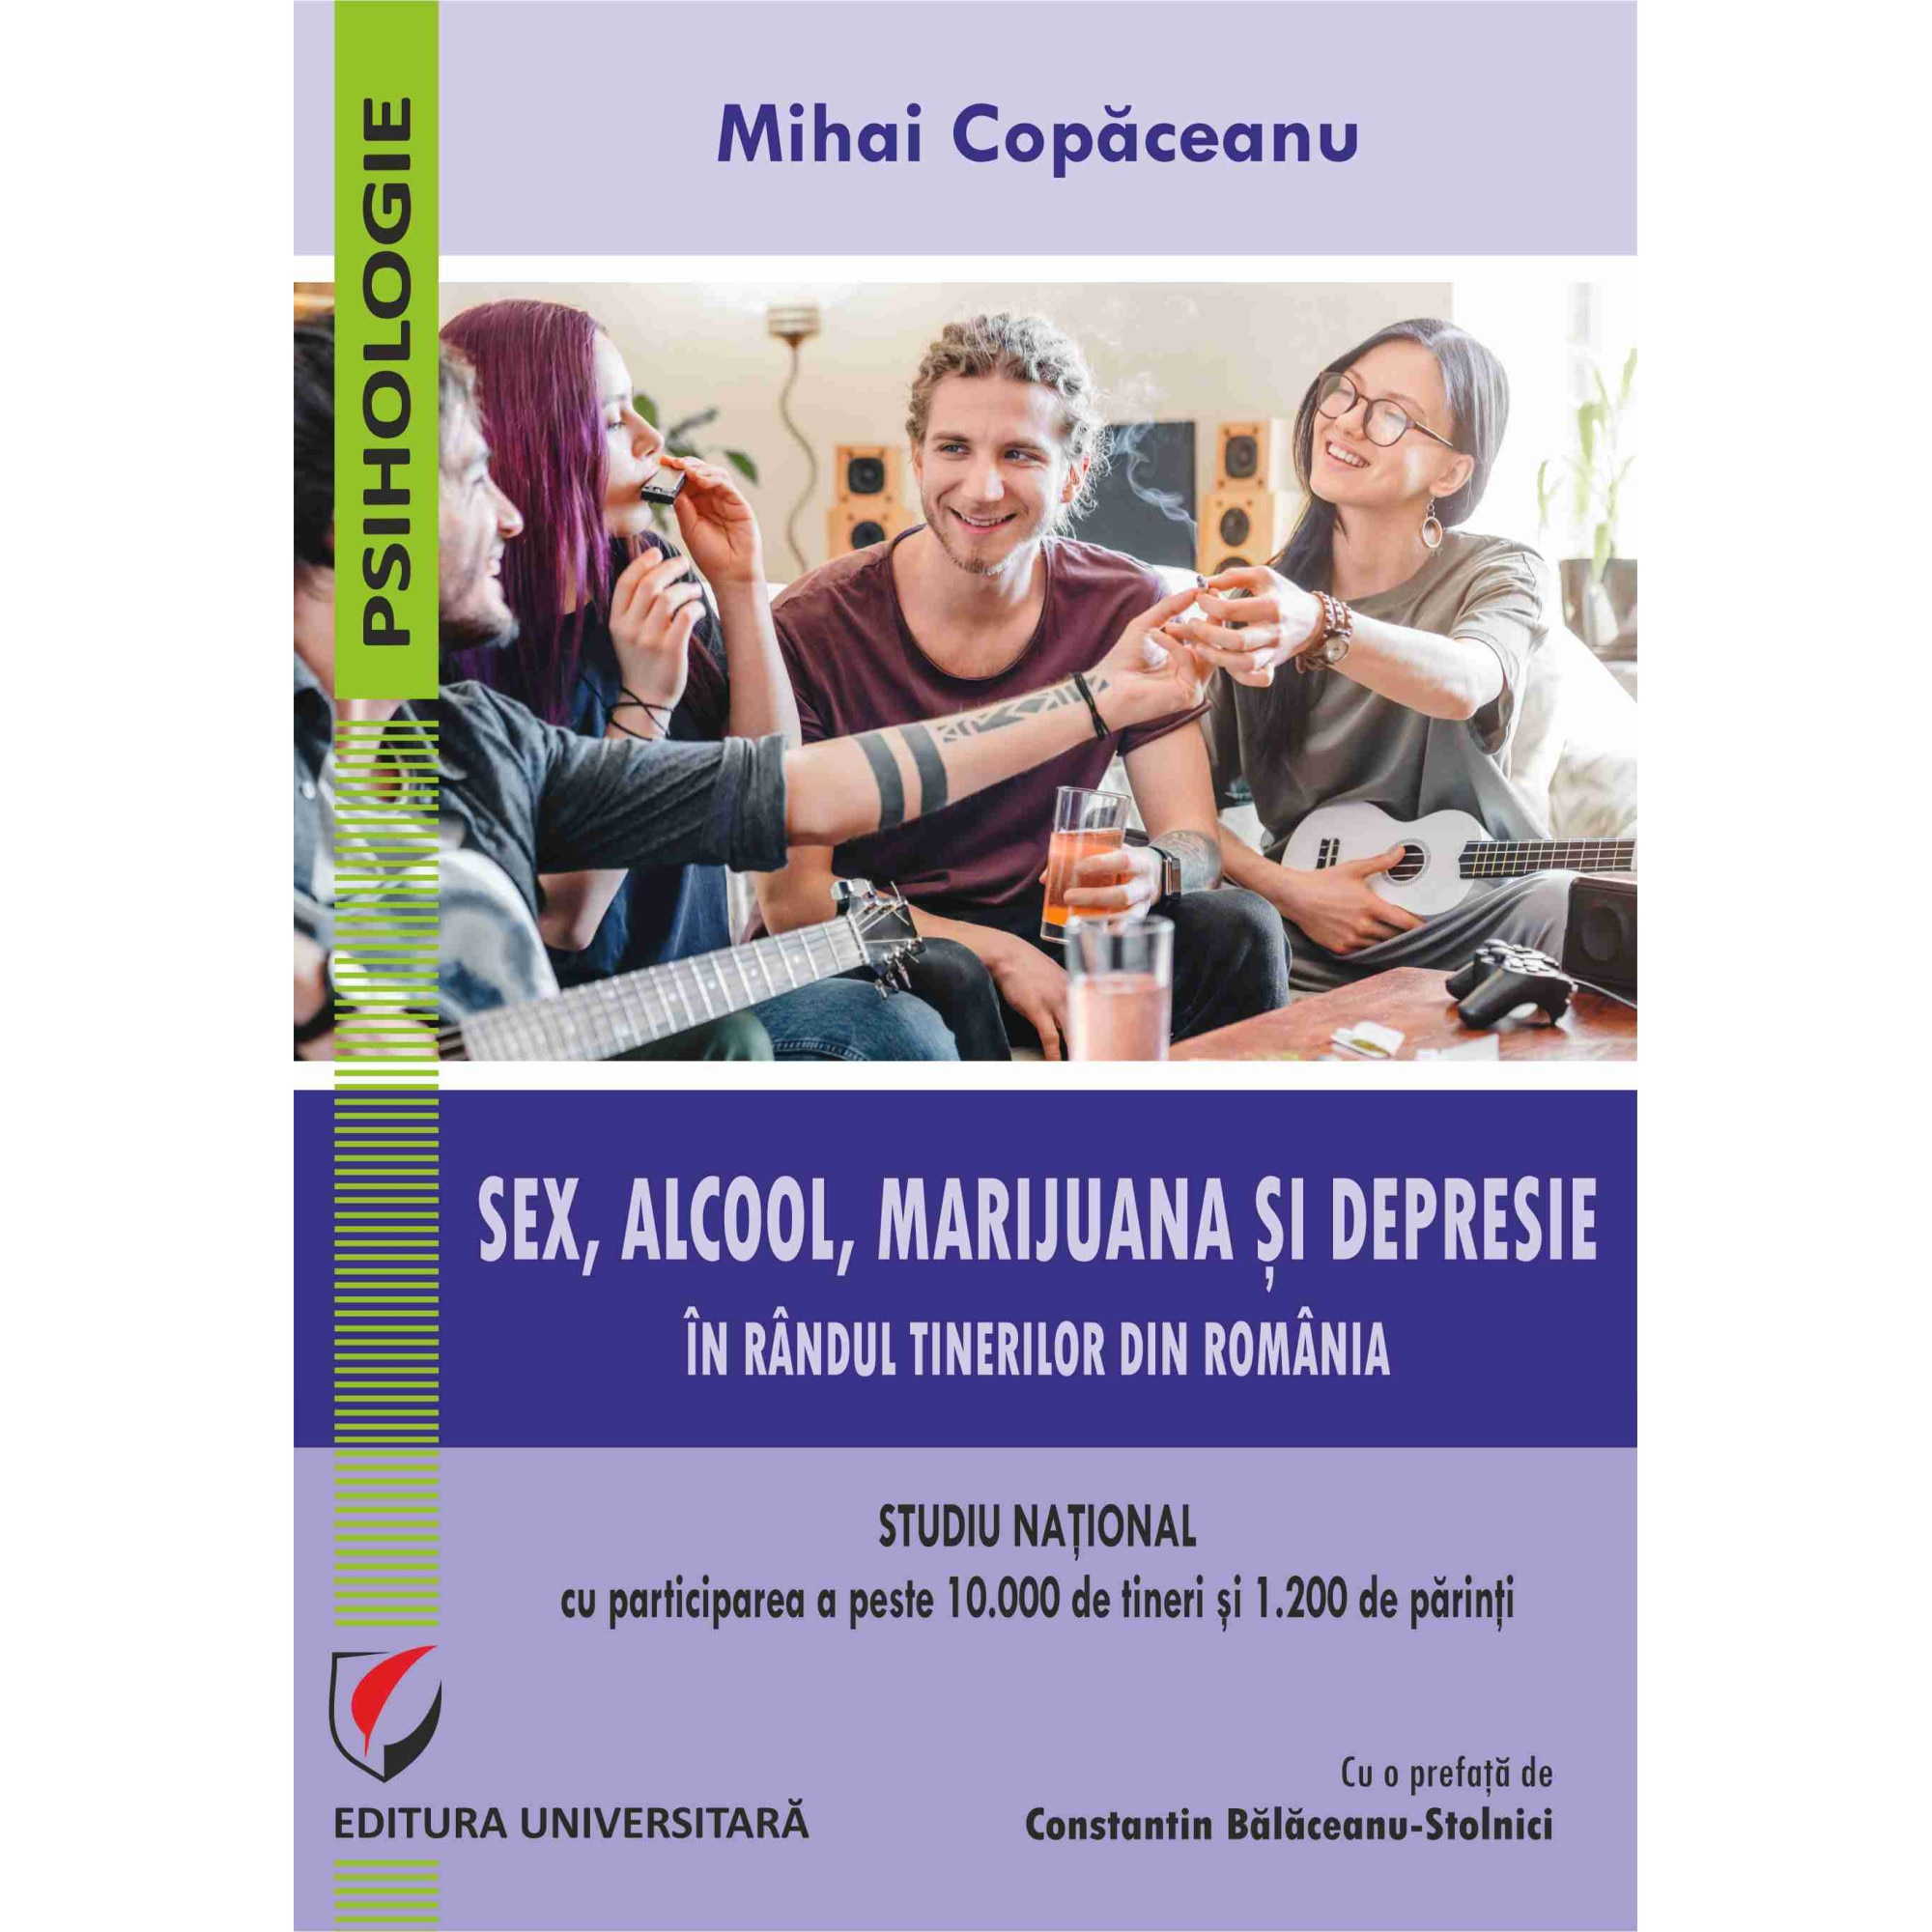 Sex, alcool, marijuana si depresie in randul tinerilor din Romania